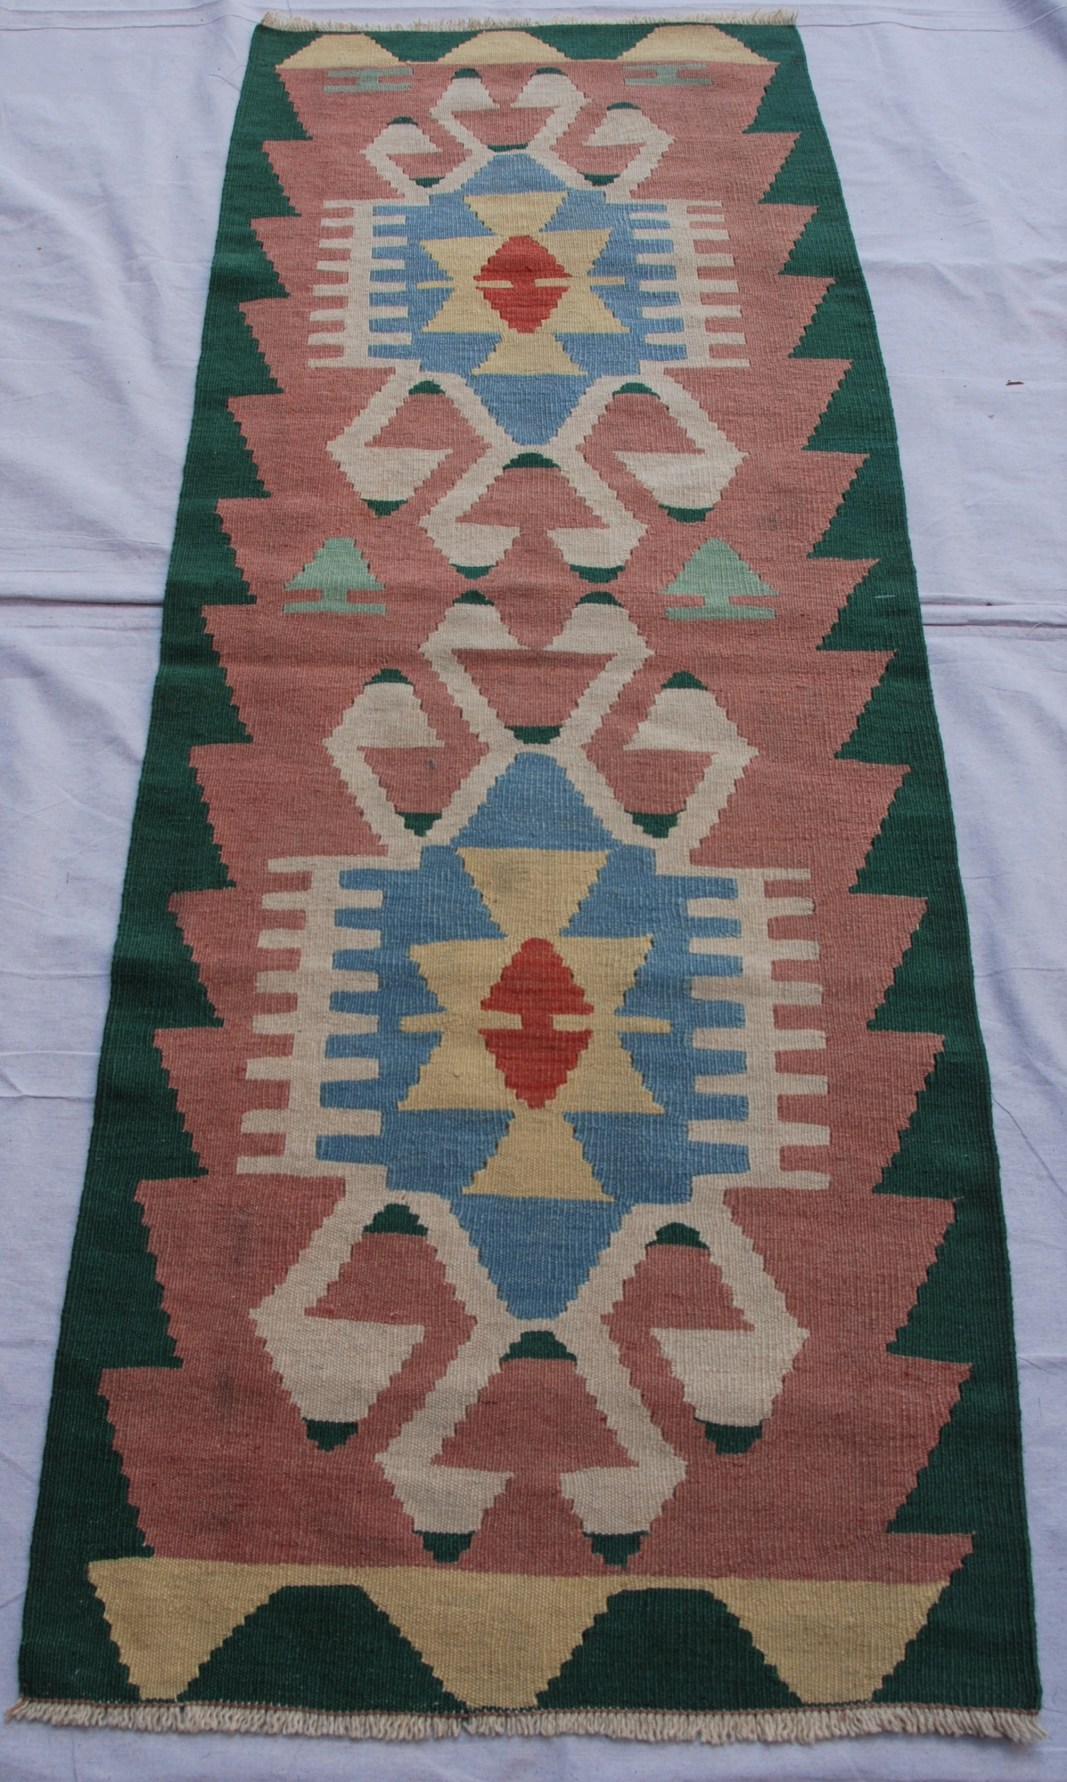 Turkish Kayseri hand knotted wool on wool kilim 20-30 years old 1.69 x 0.61 $245